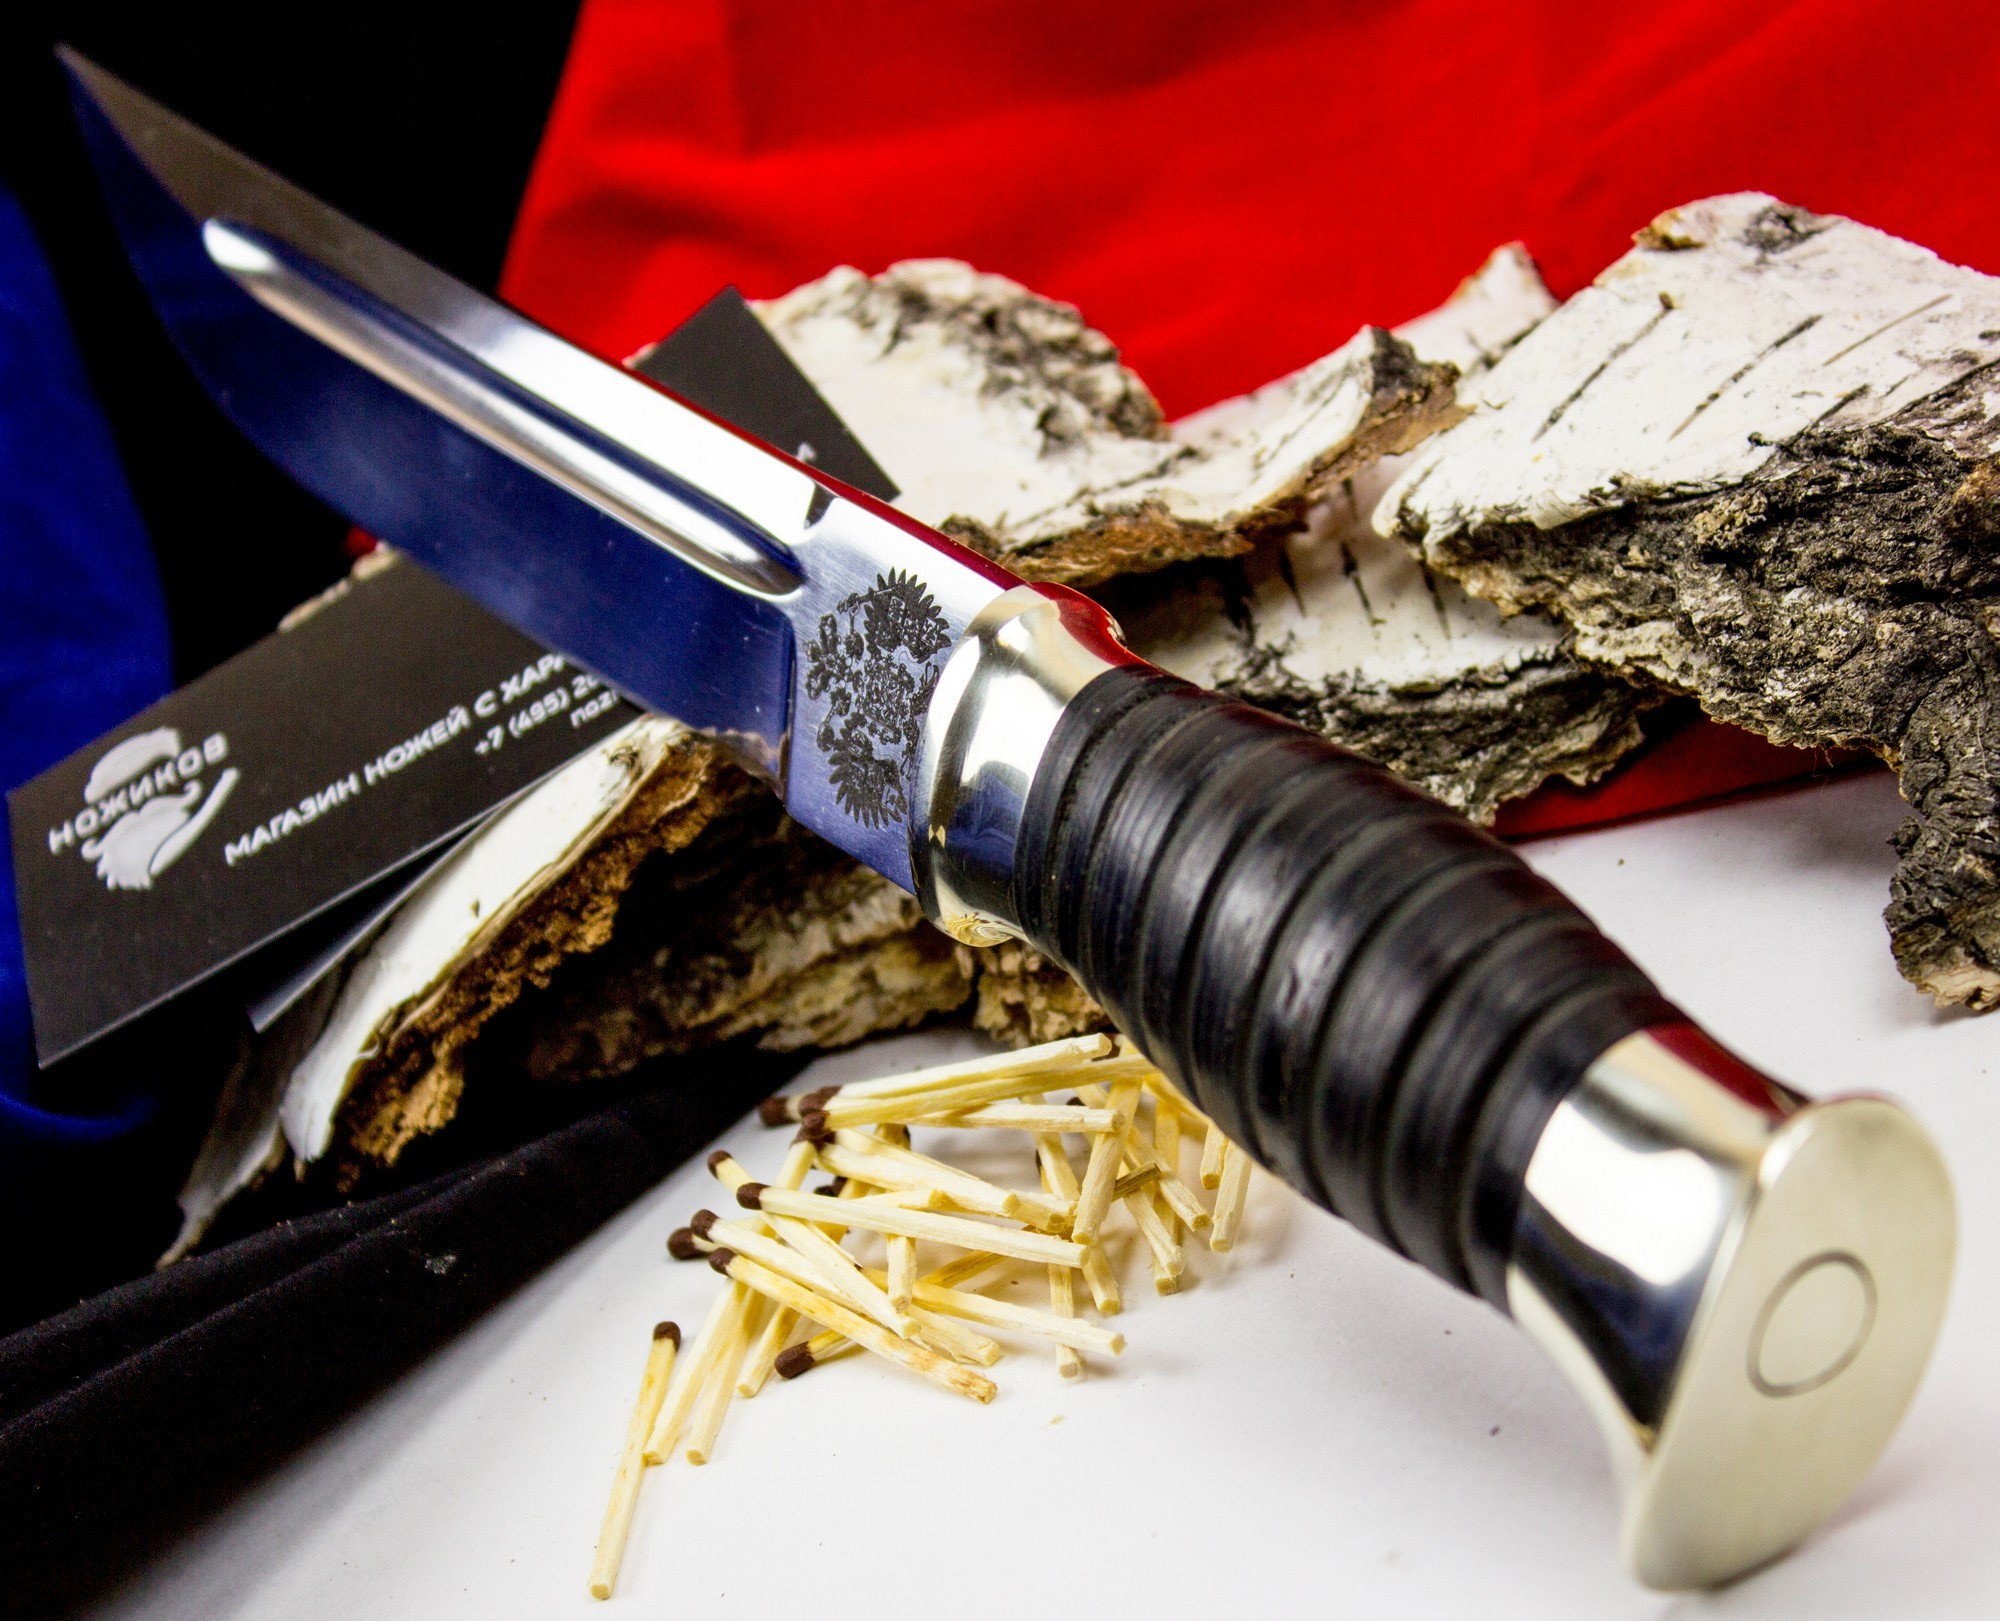 Фото 3 - Пластунский кованый нож Казак, Х12МФ, мельхиор от Кузница Семина